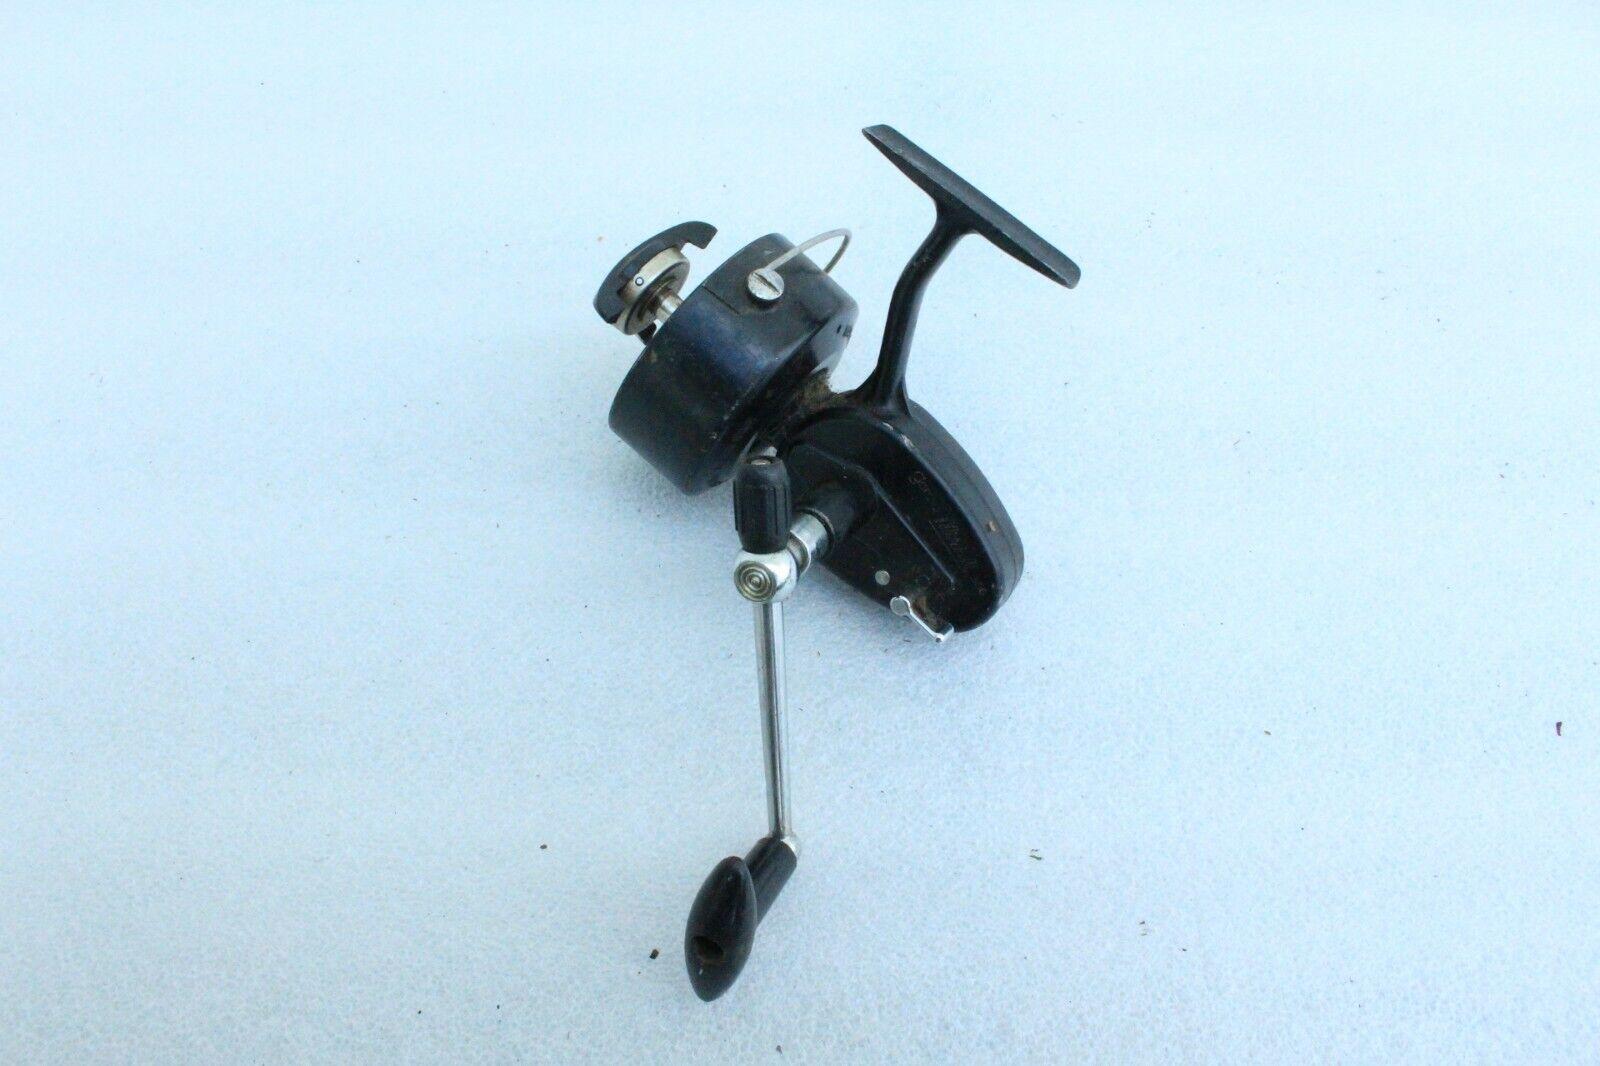 Vintage Garcia Mitchell 306 Spinning Fishing Reel Collector Rare Ser No. 098105